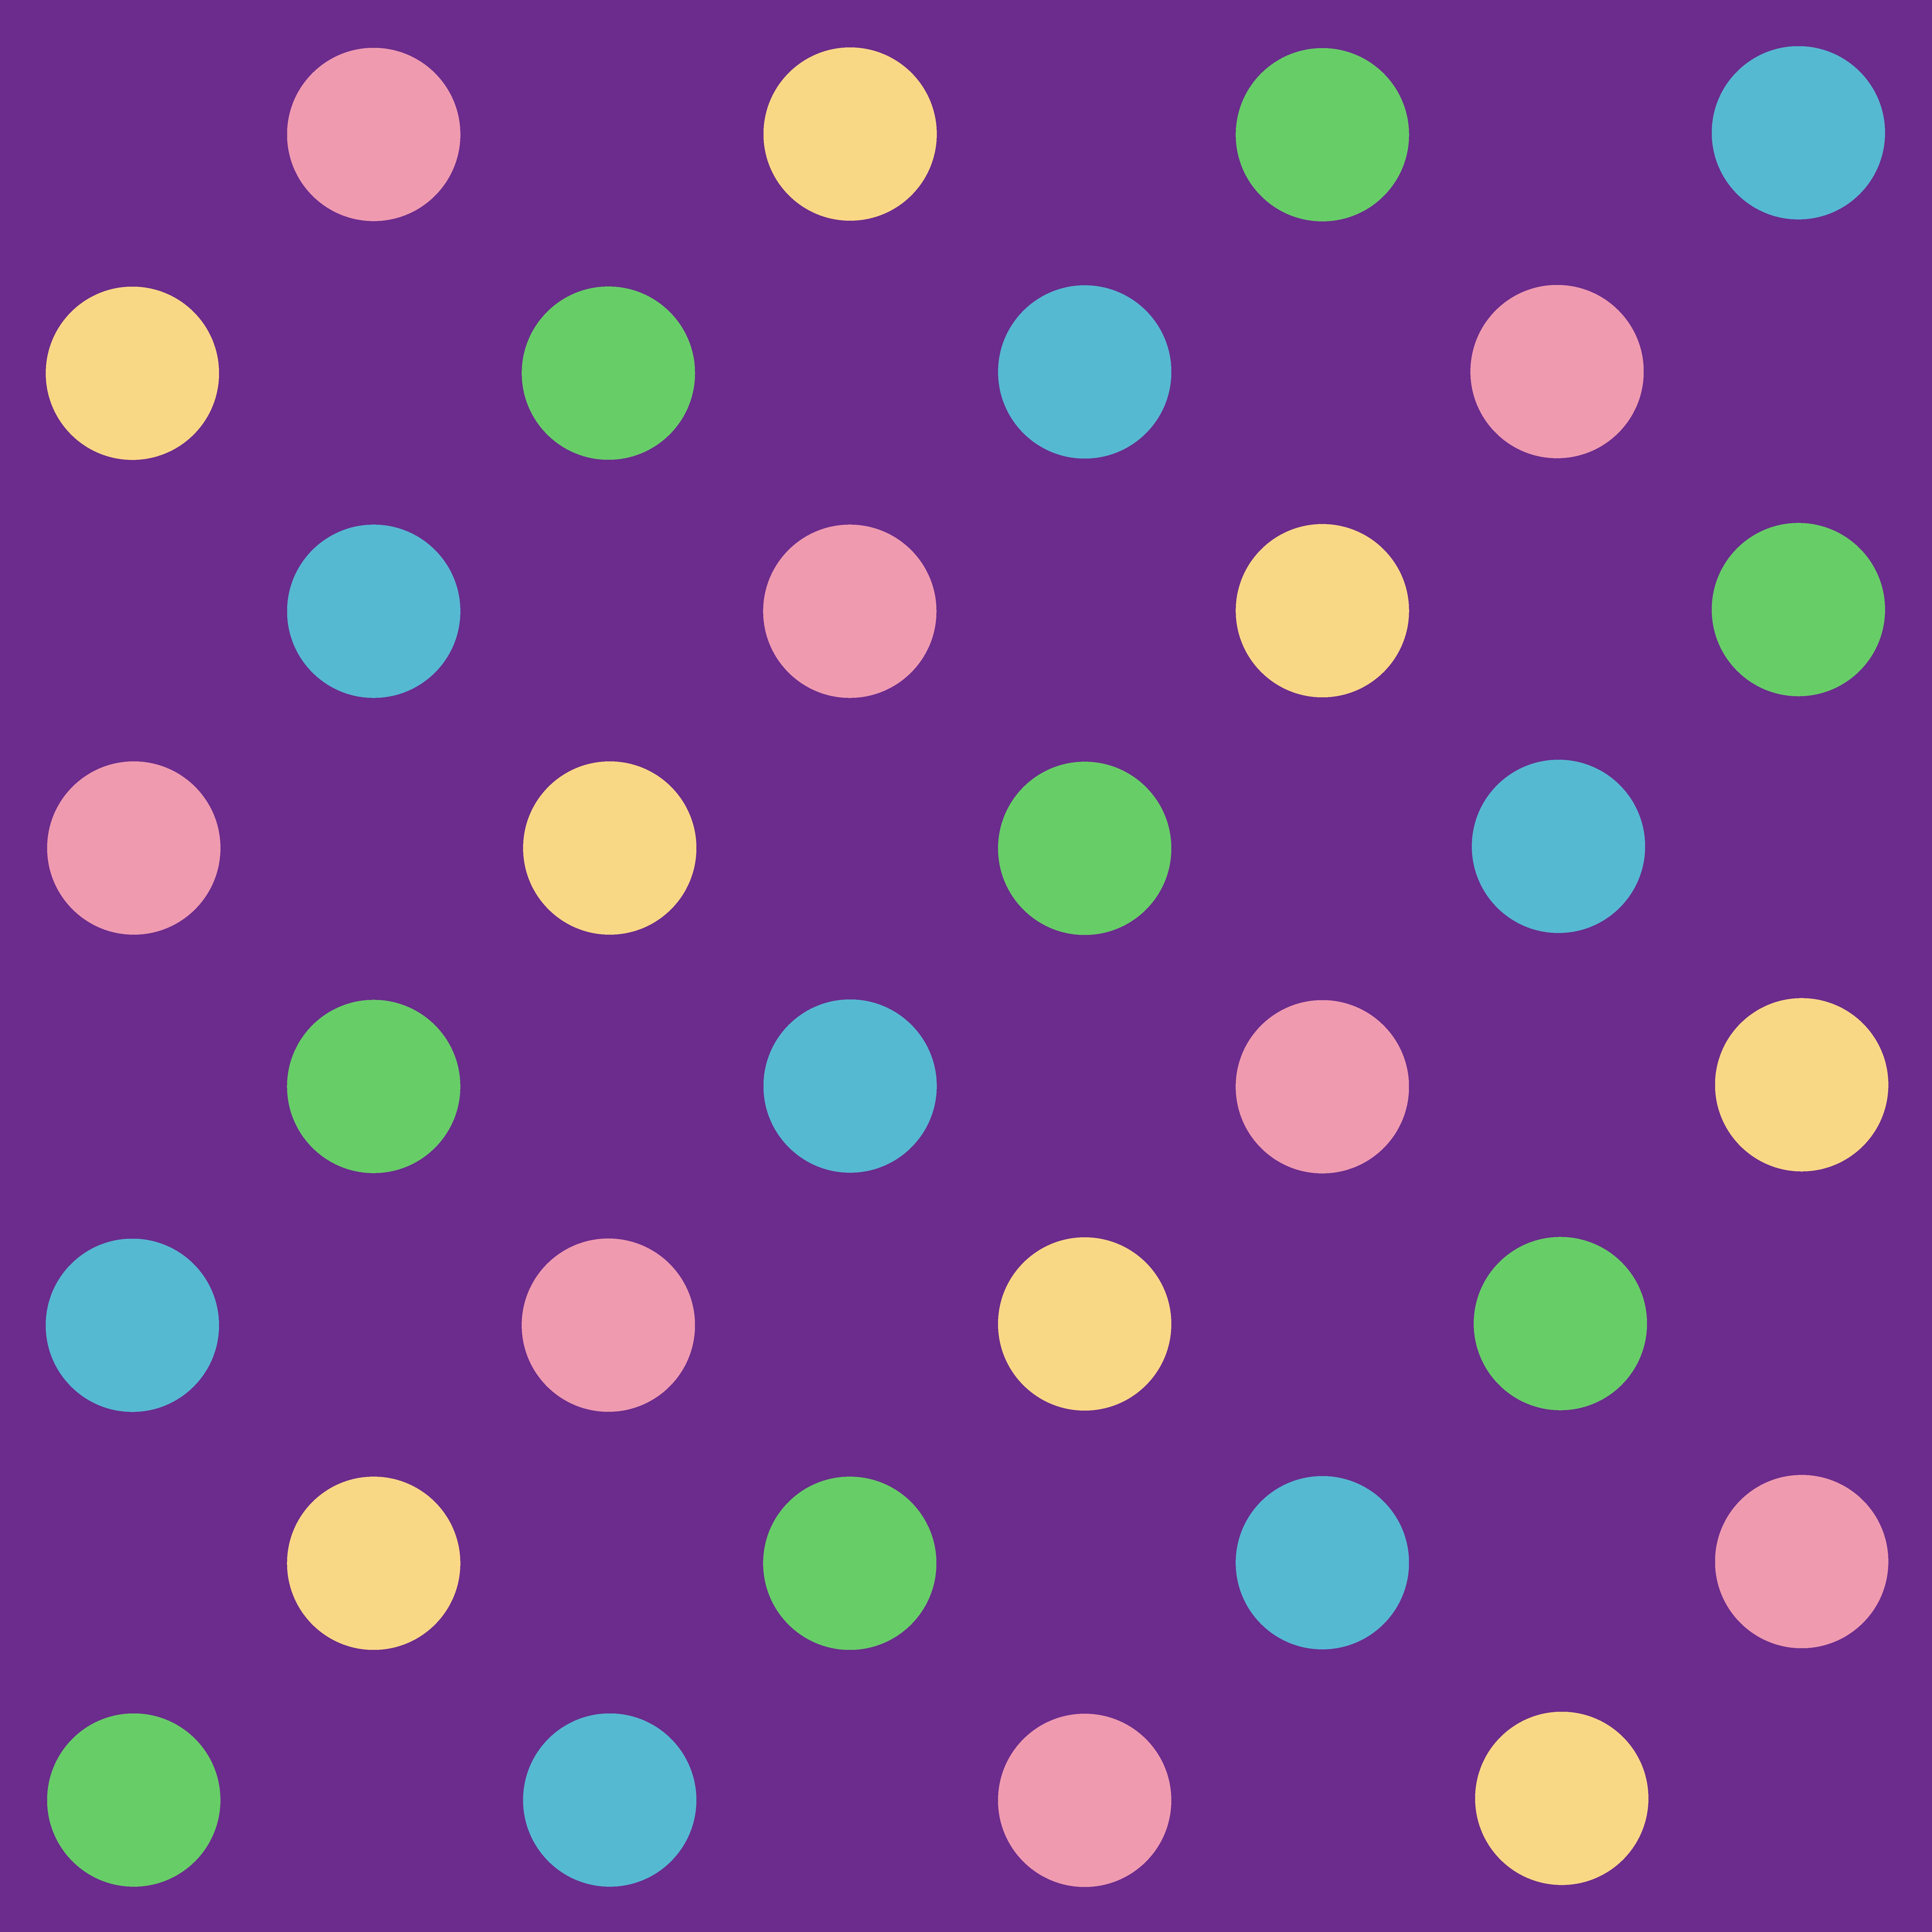 Polka dot pattern clipart black and white Cute Colorful Polka Dots Pattern - Free Clip Art black and white